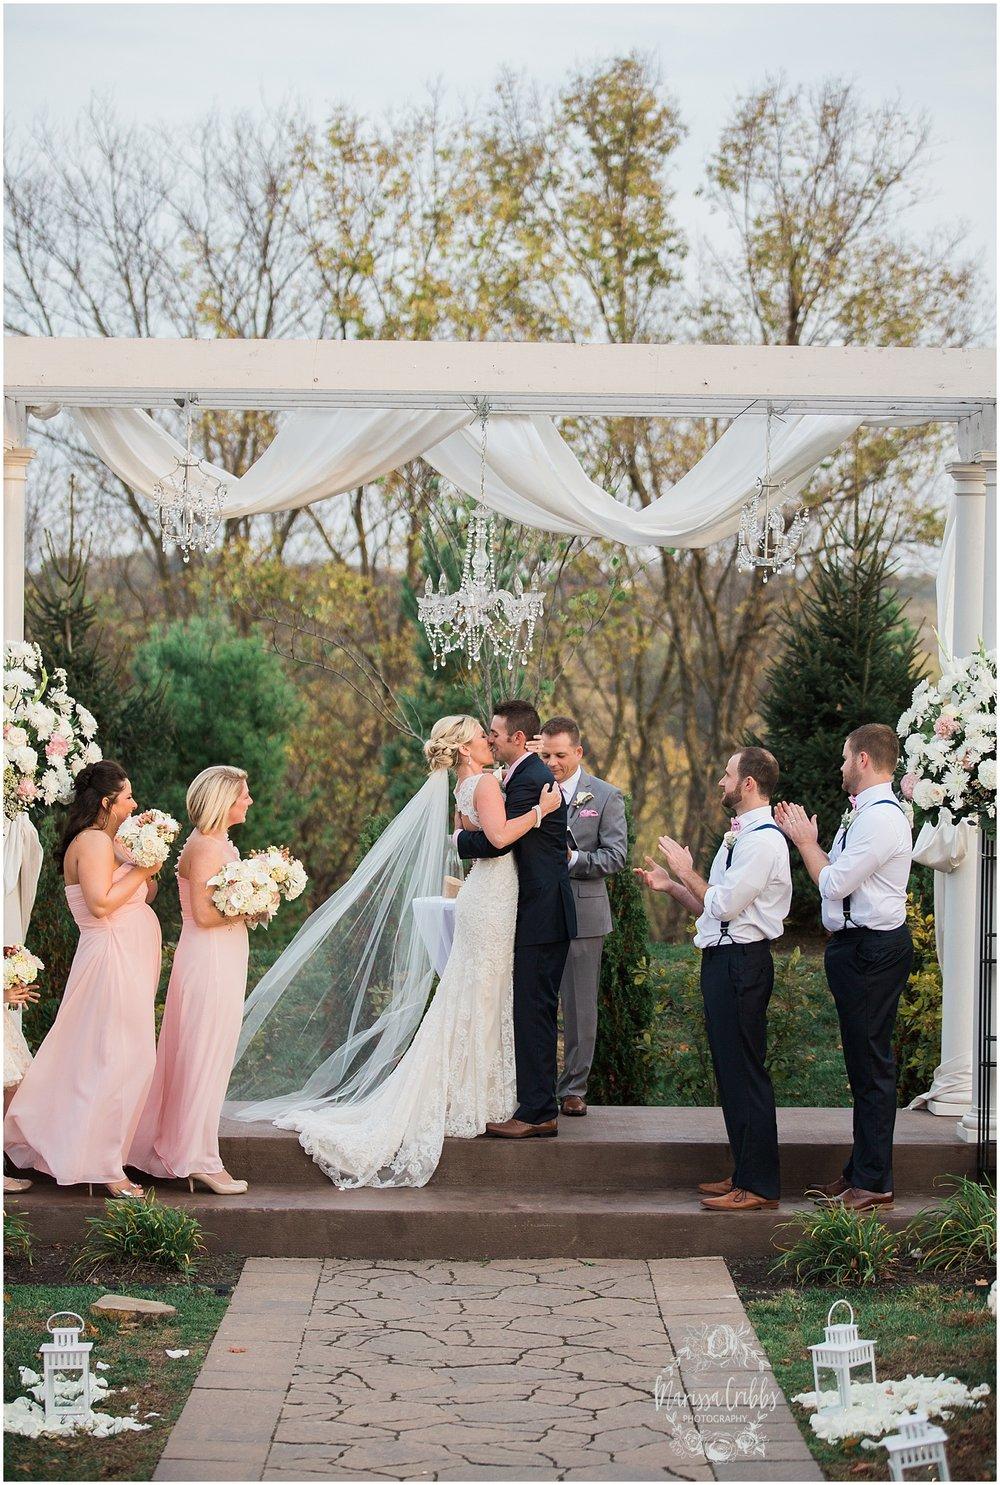 Alex & Amie | Eighteen Ninety Event Space | Marissa Cribbs Photography | Kansas City Perfect Wedding Guide_1356.jpg